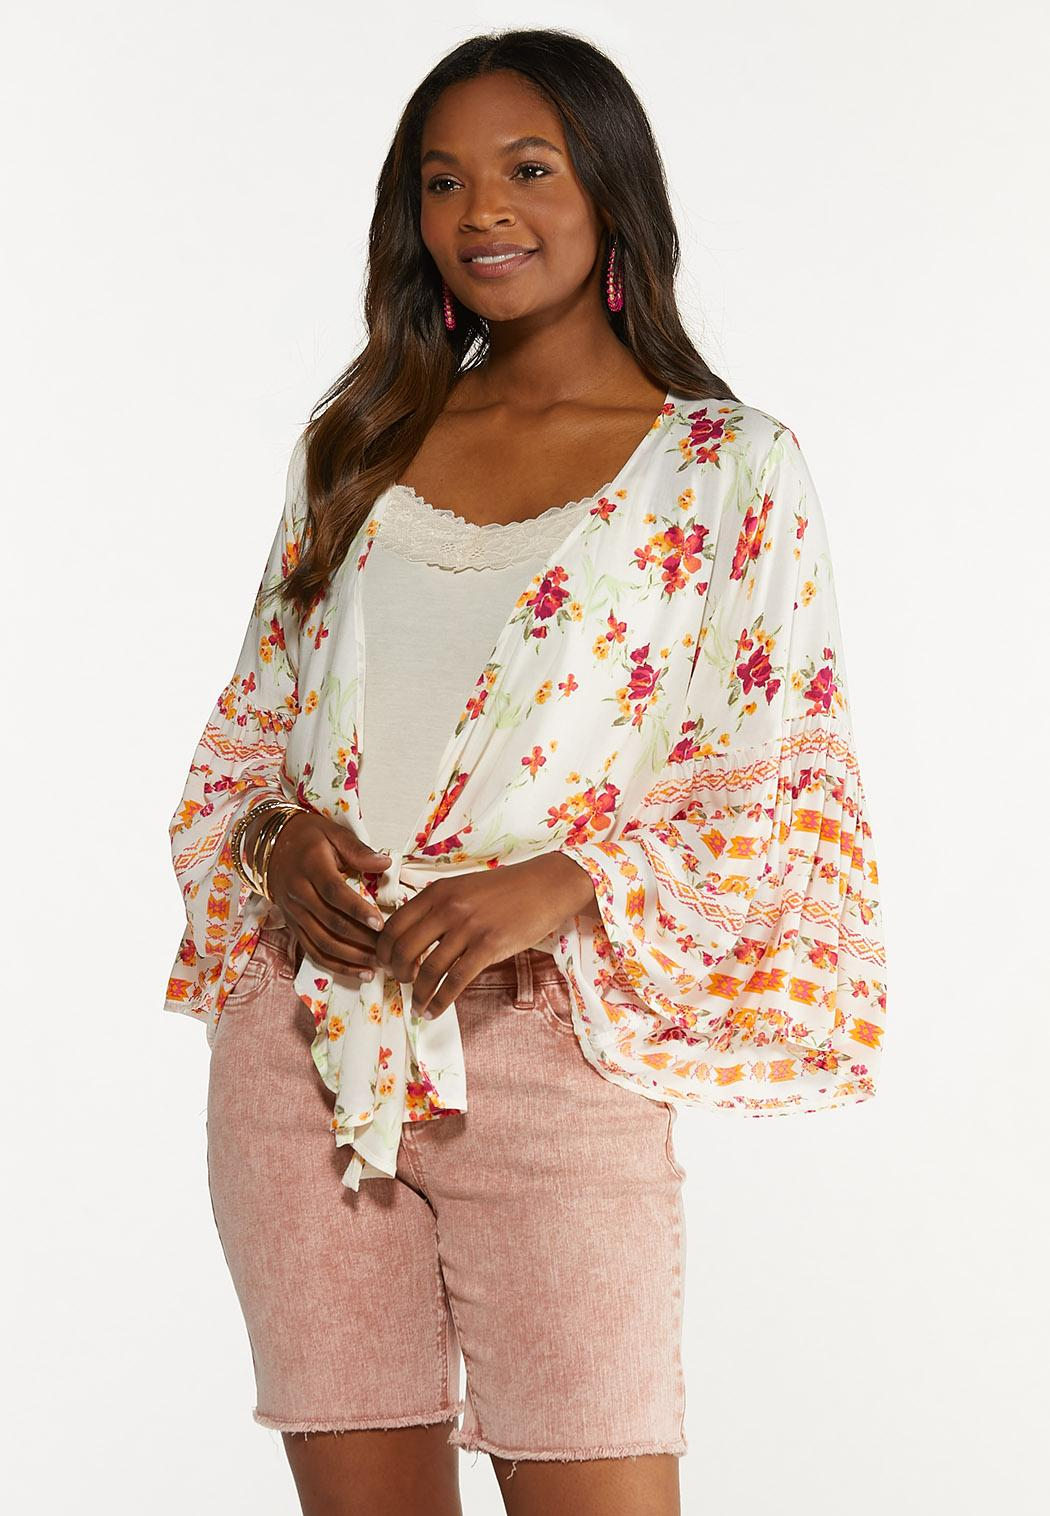 Floral Tie Front Cardigan Top